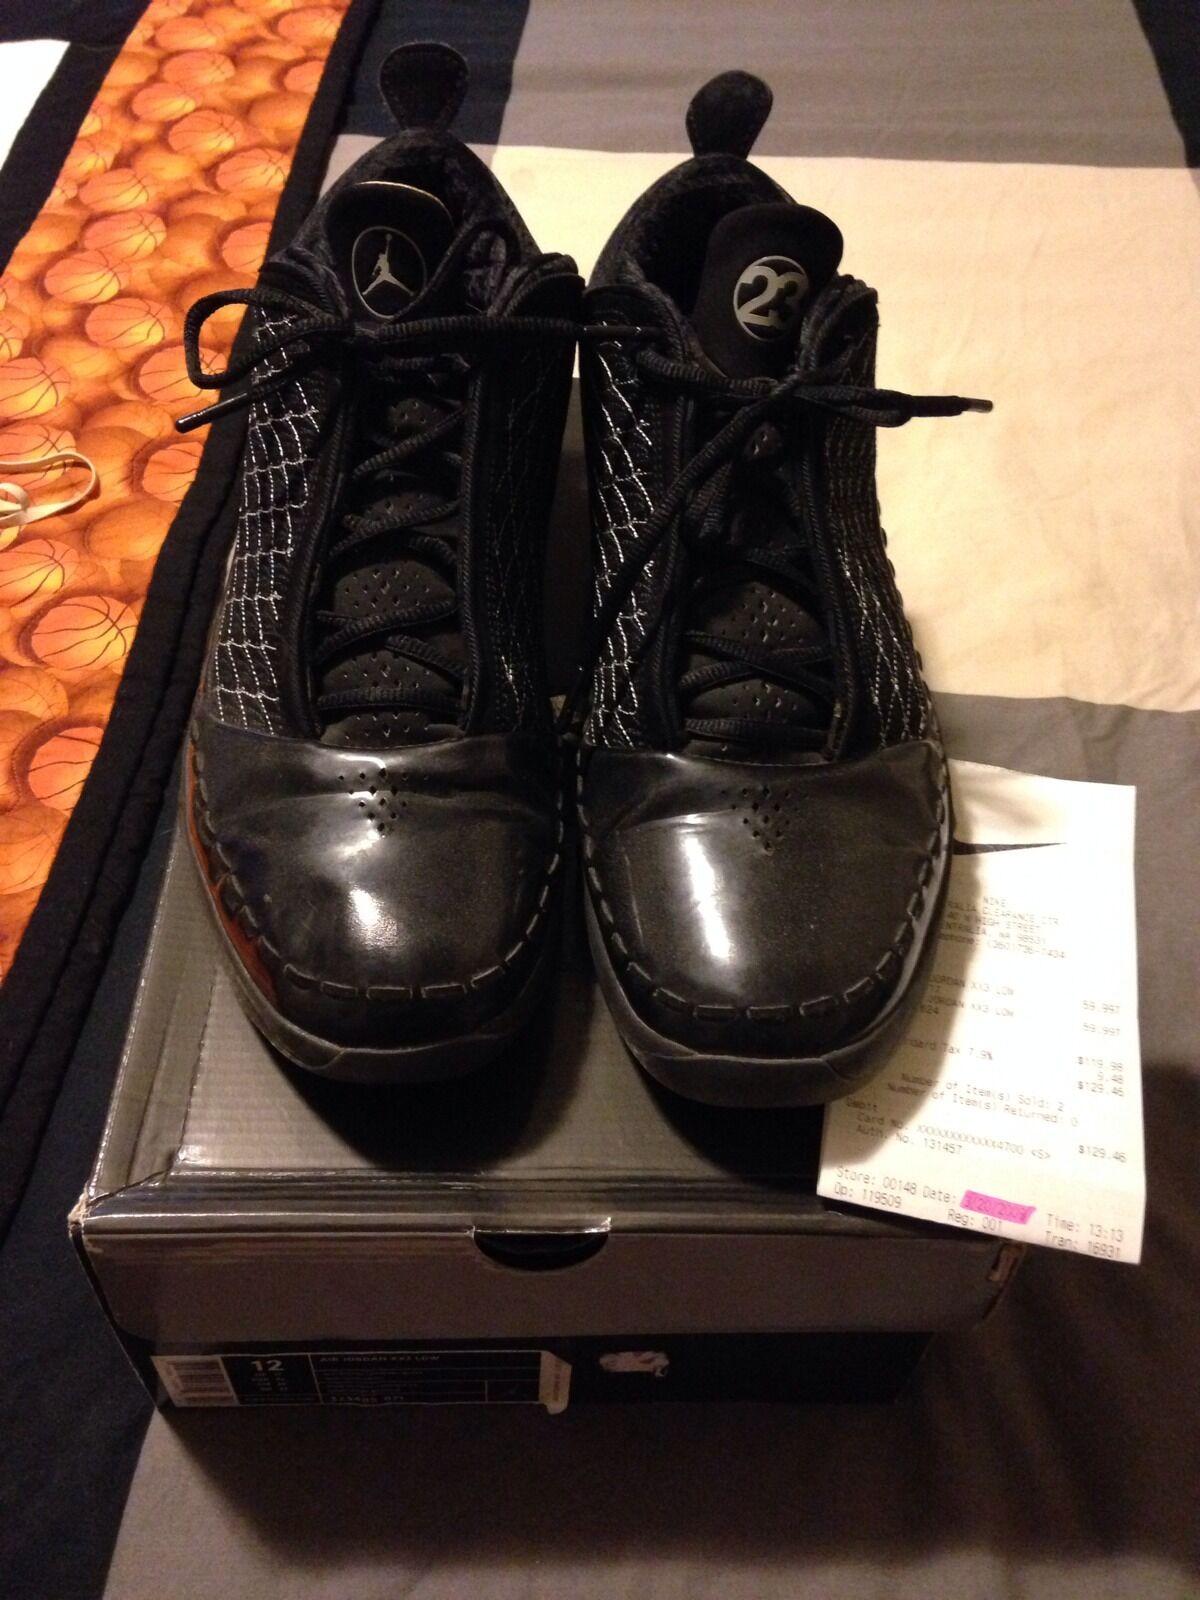 Nike Air Jordan Retro 23 Low Size 12 100% Authentic